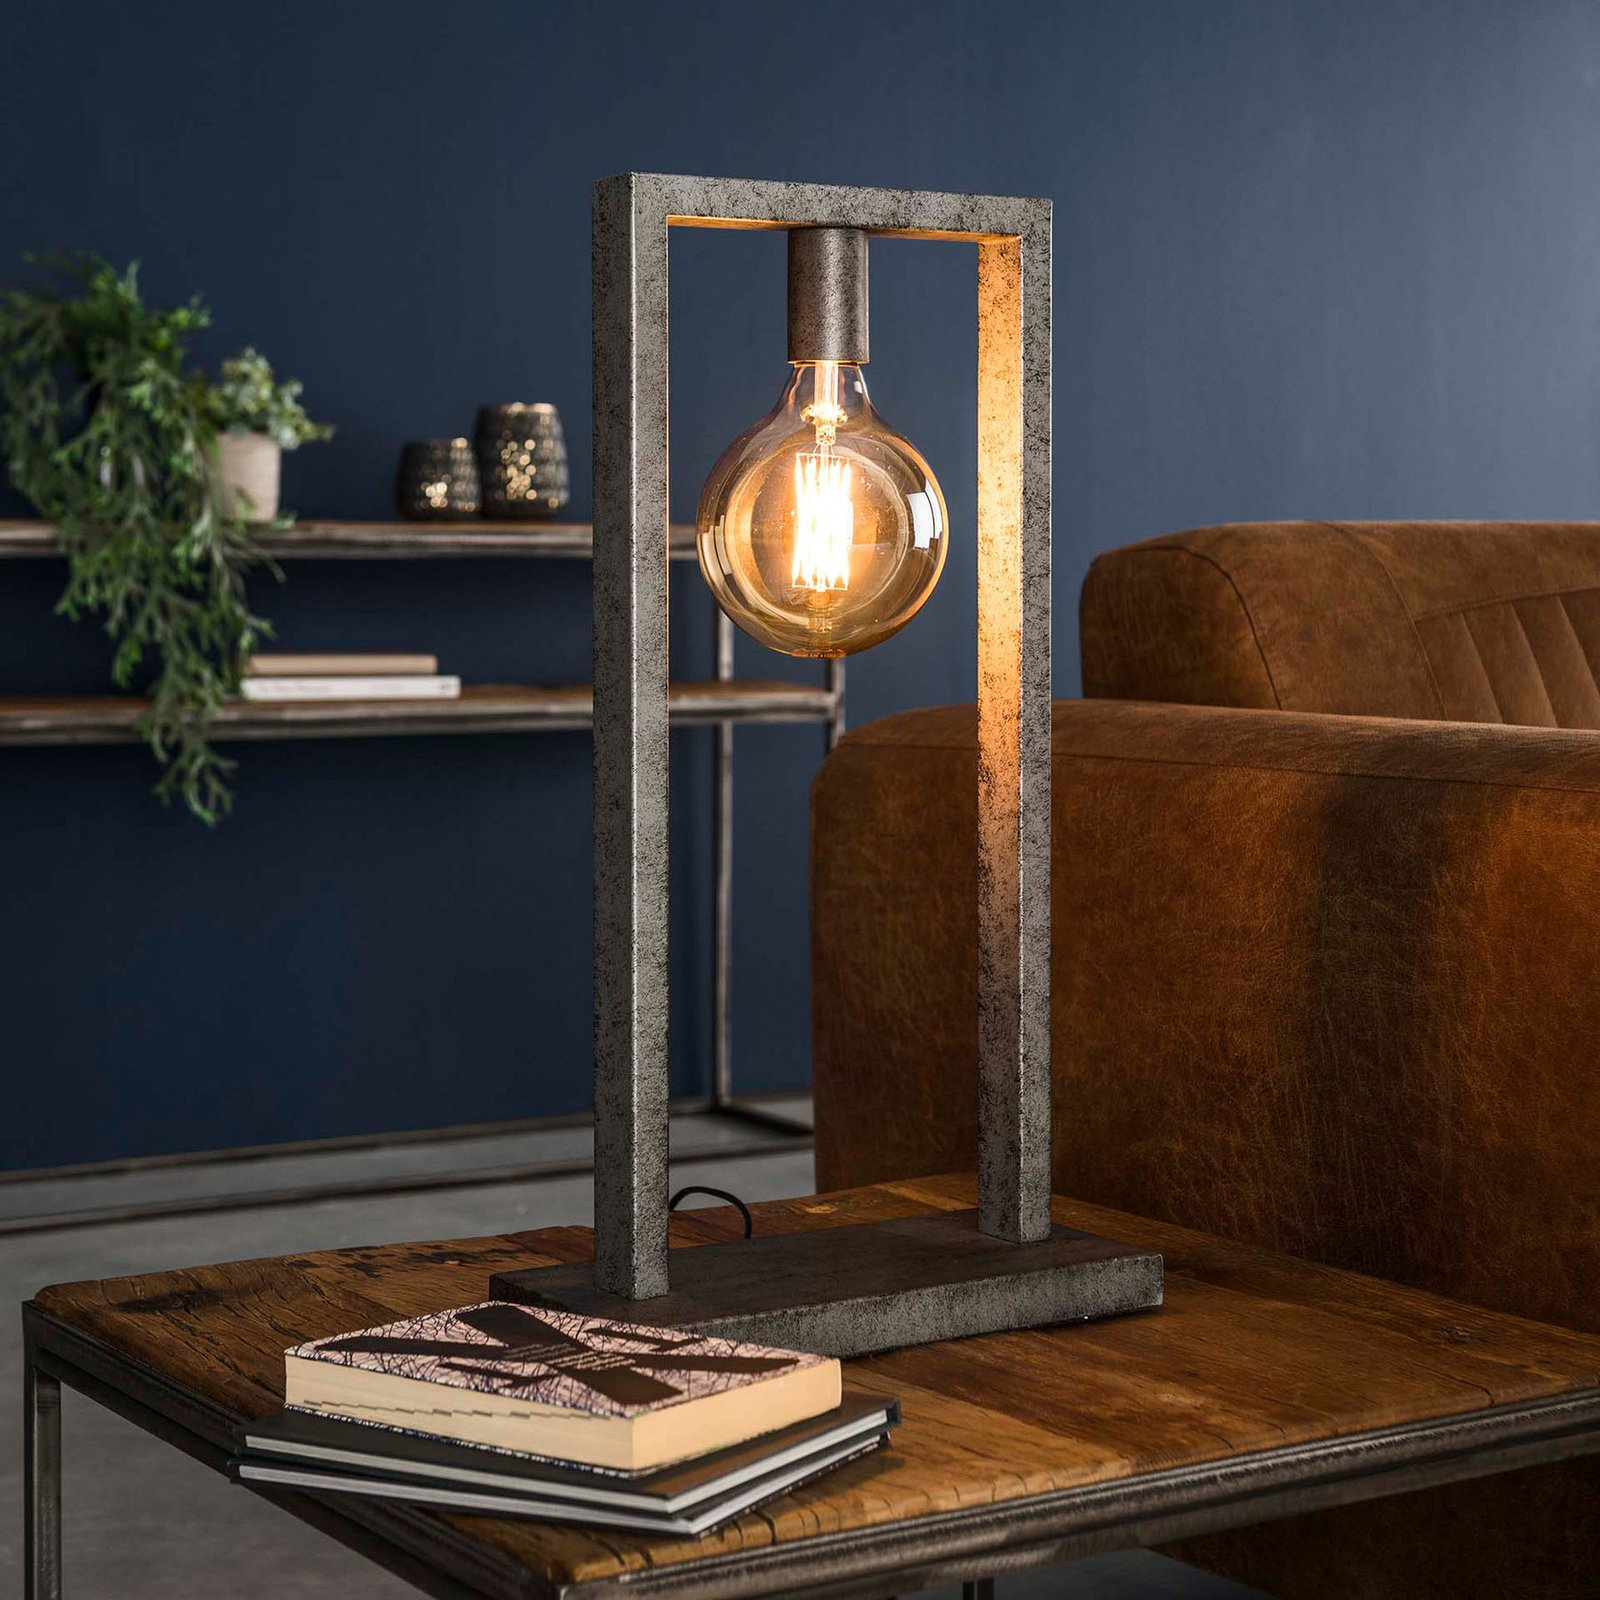 Bordlampe Portalight, høyde 55 cm